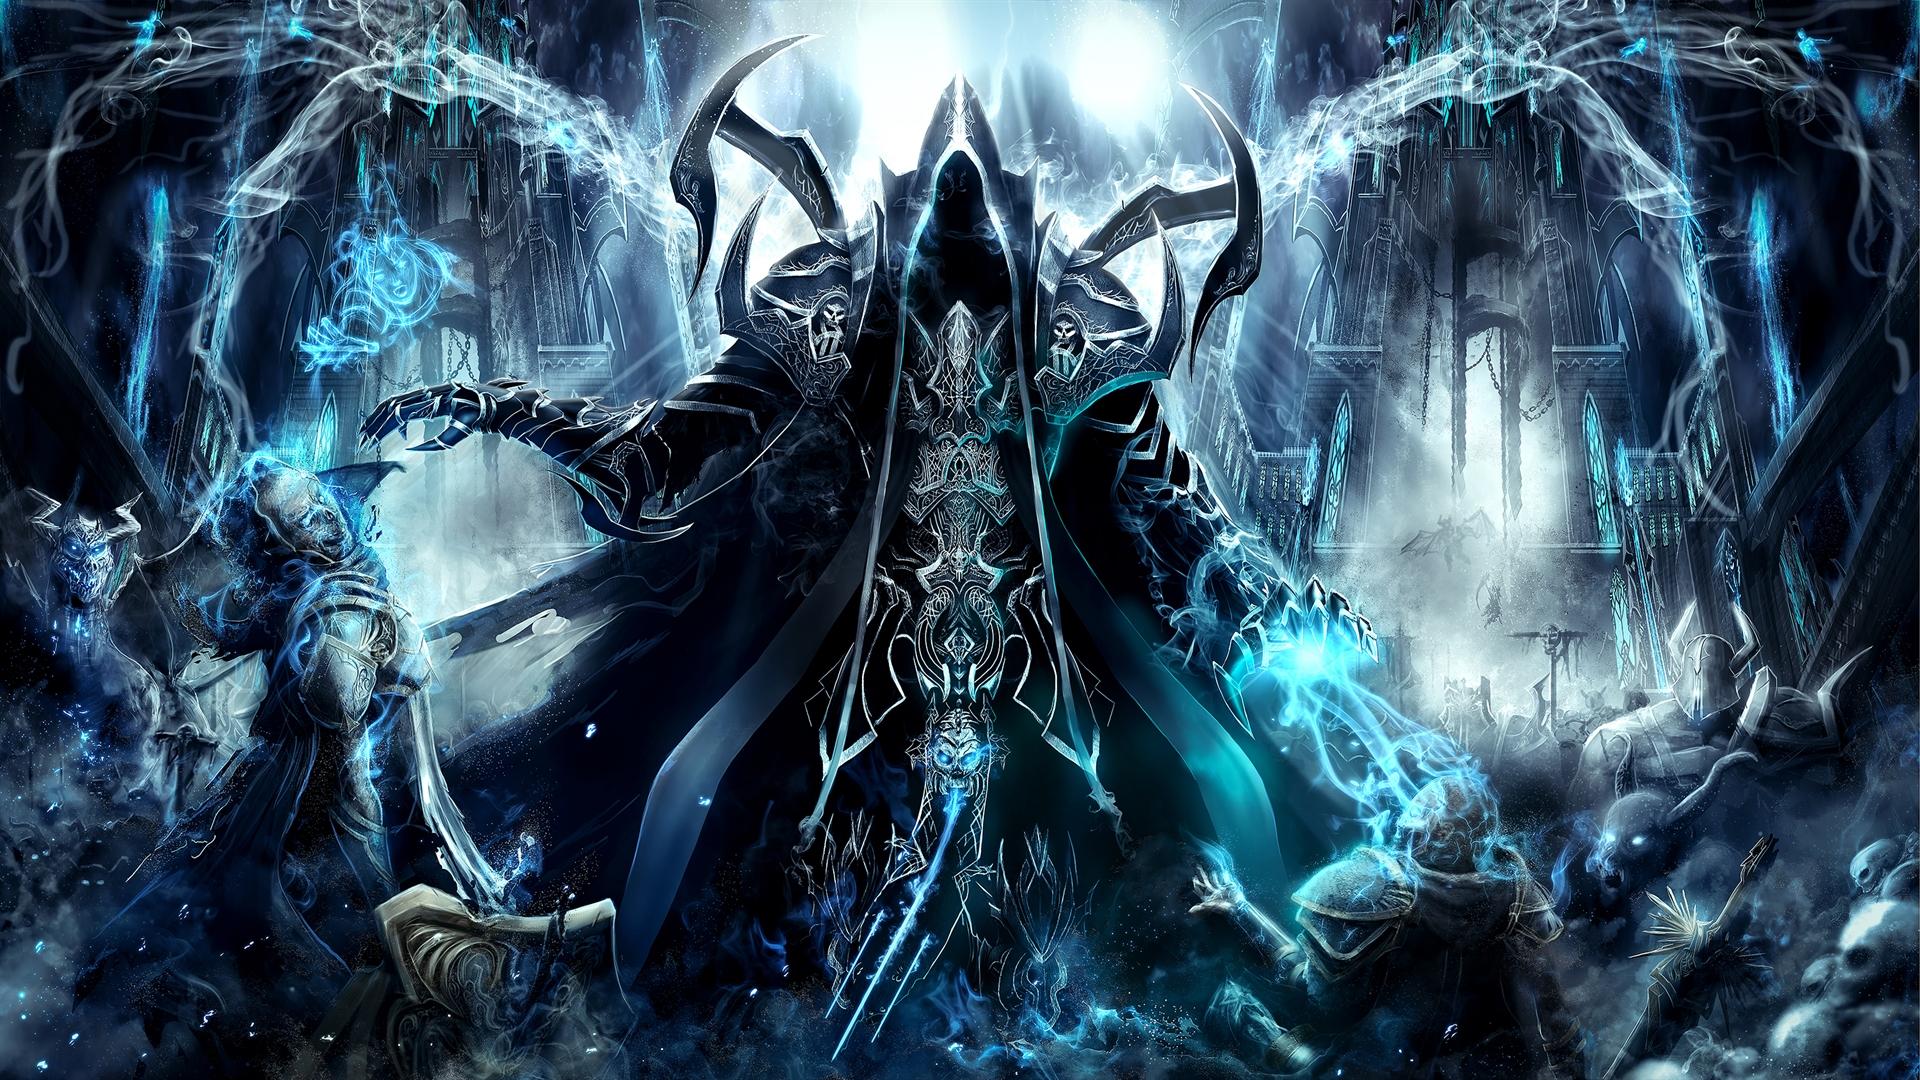 Diablo 3 Ros Wallpaper: Diablo 3: Reaper Of Souls Ultimate Evil Edition